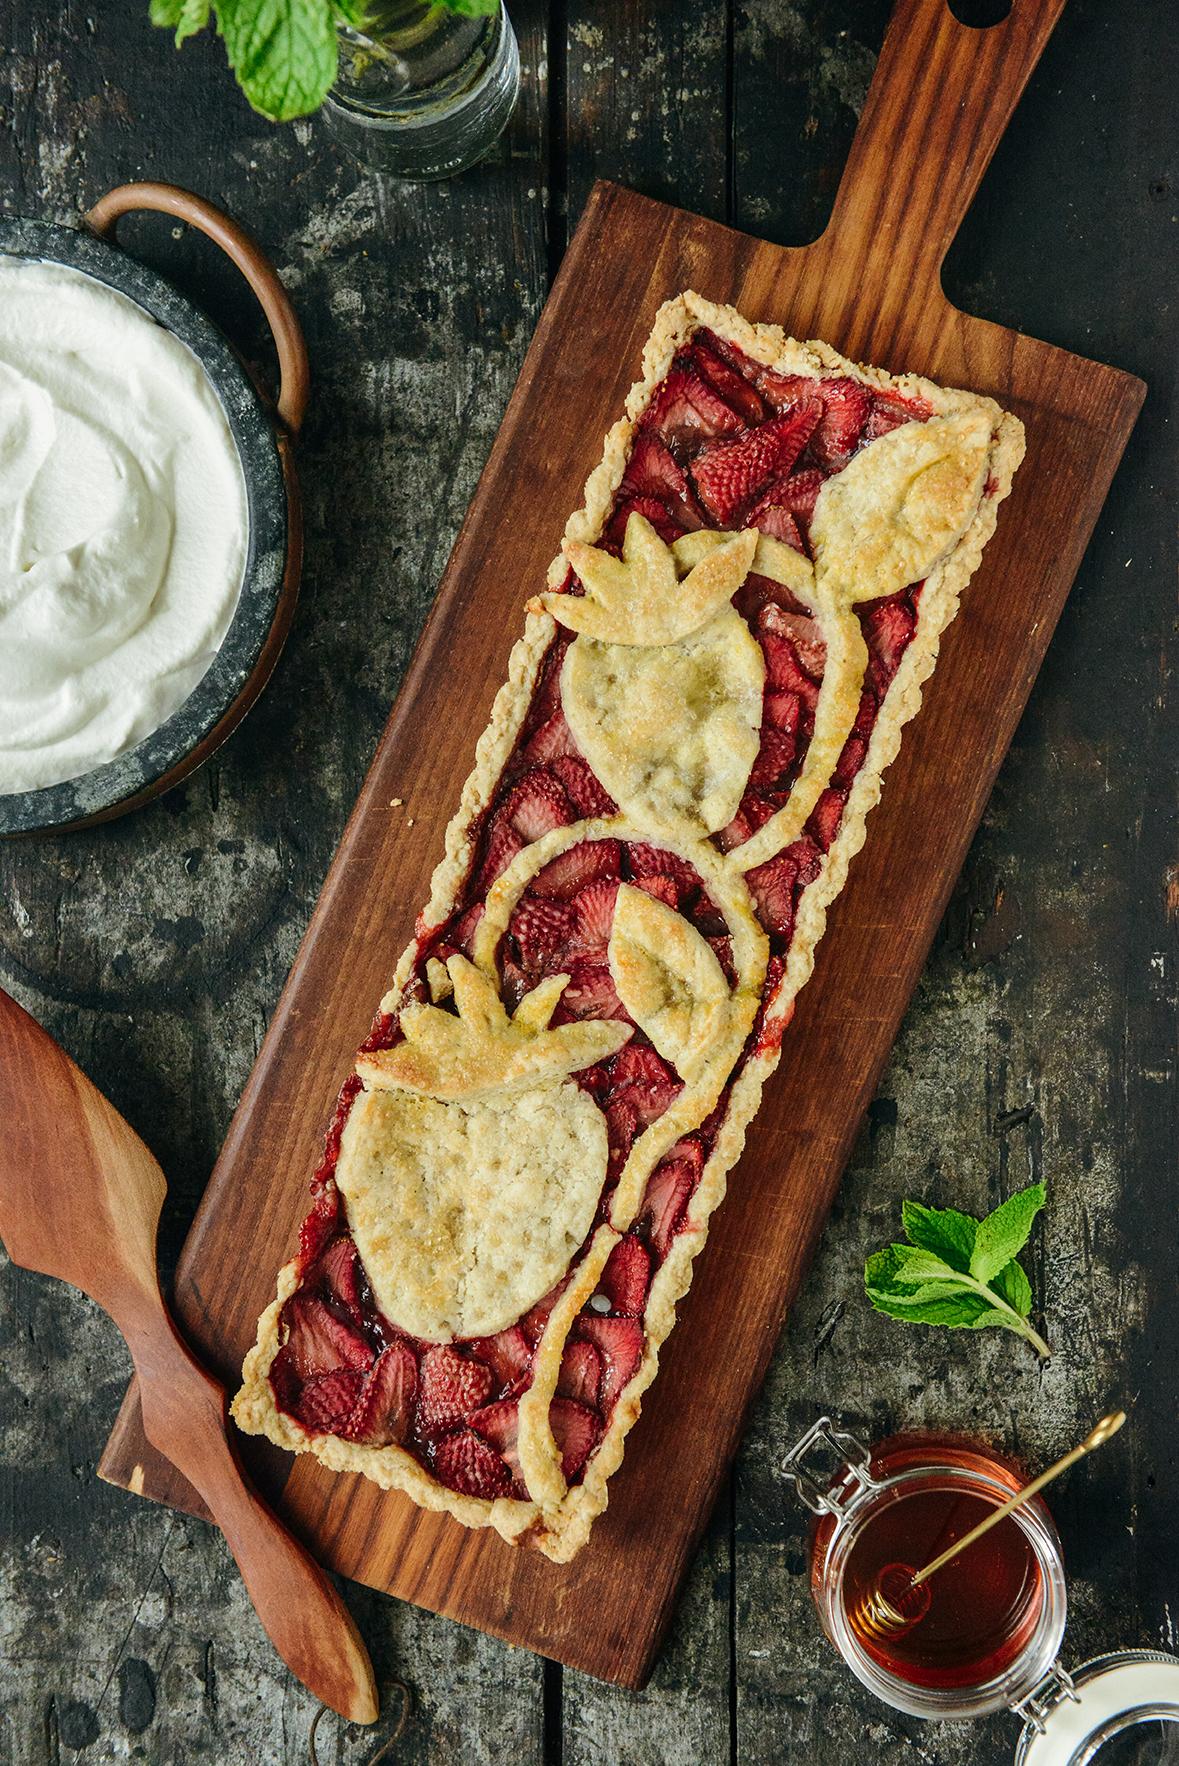 Pie for Dessert: Strawberry Tart with an Oat Flour Crust